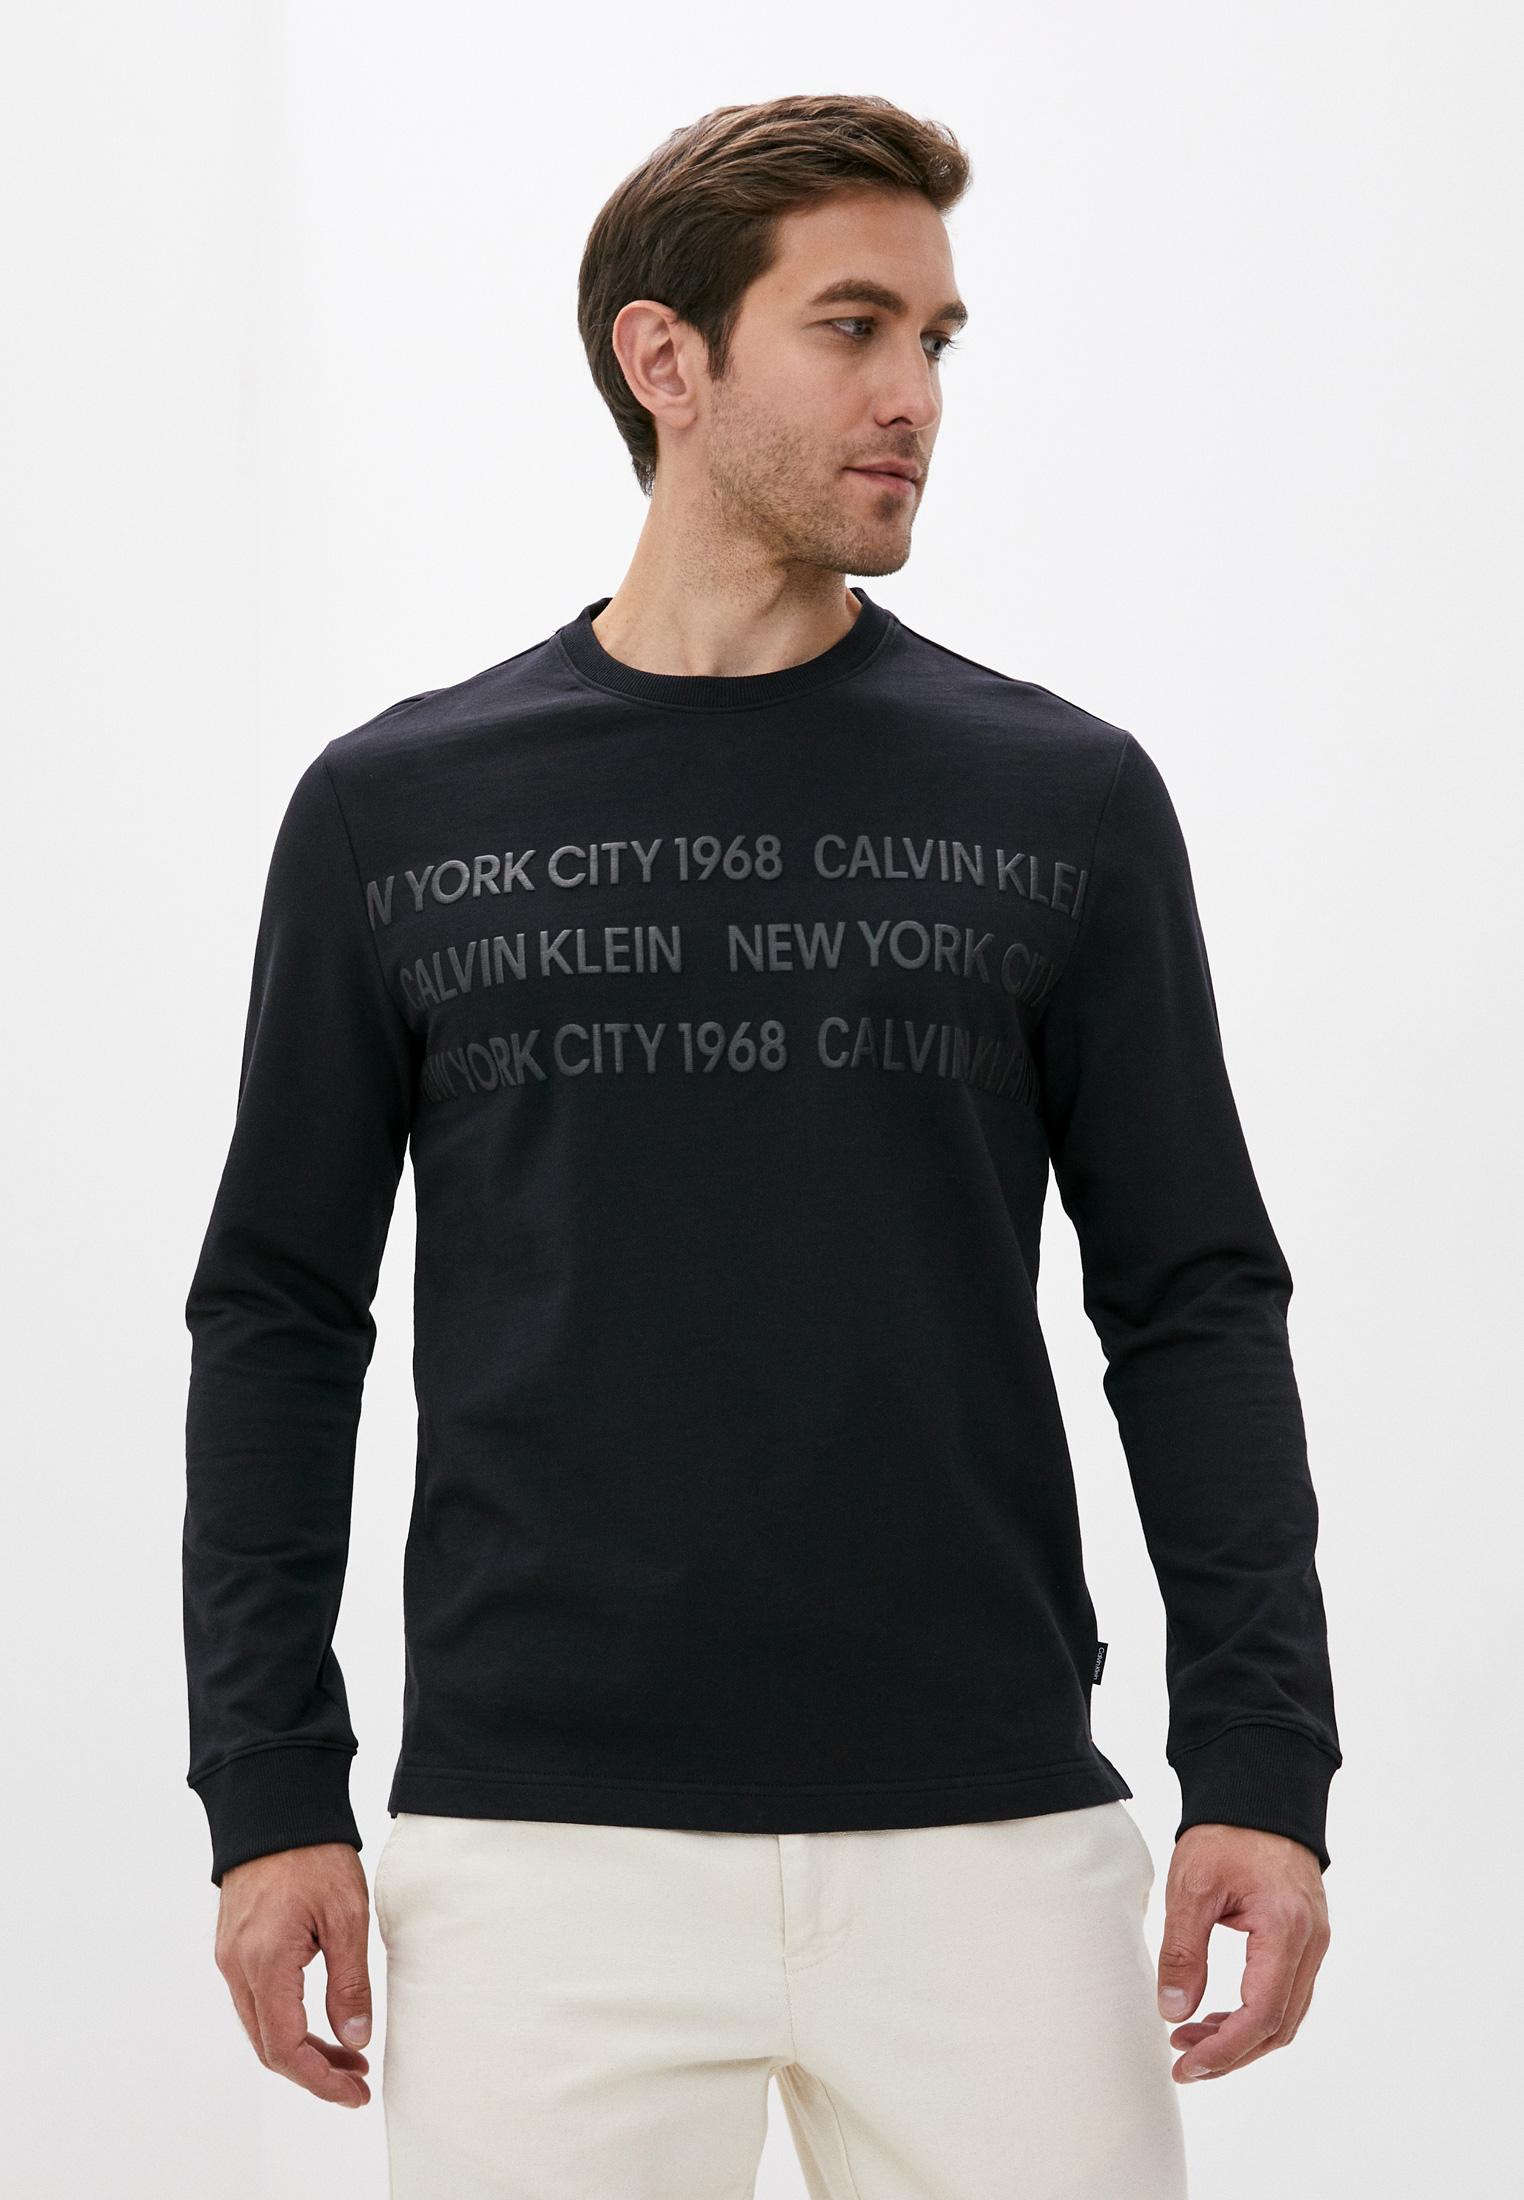 Футболка с длинным рукавом Calvin Klein (Кельвин Кляйн) k10k105956